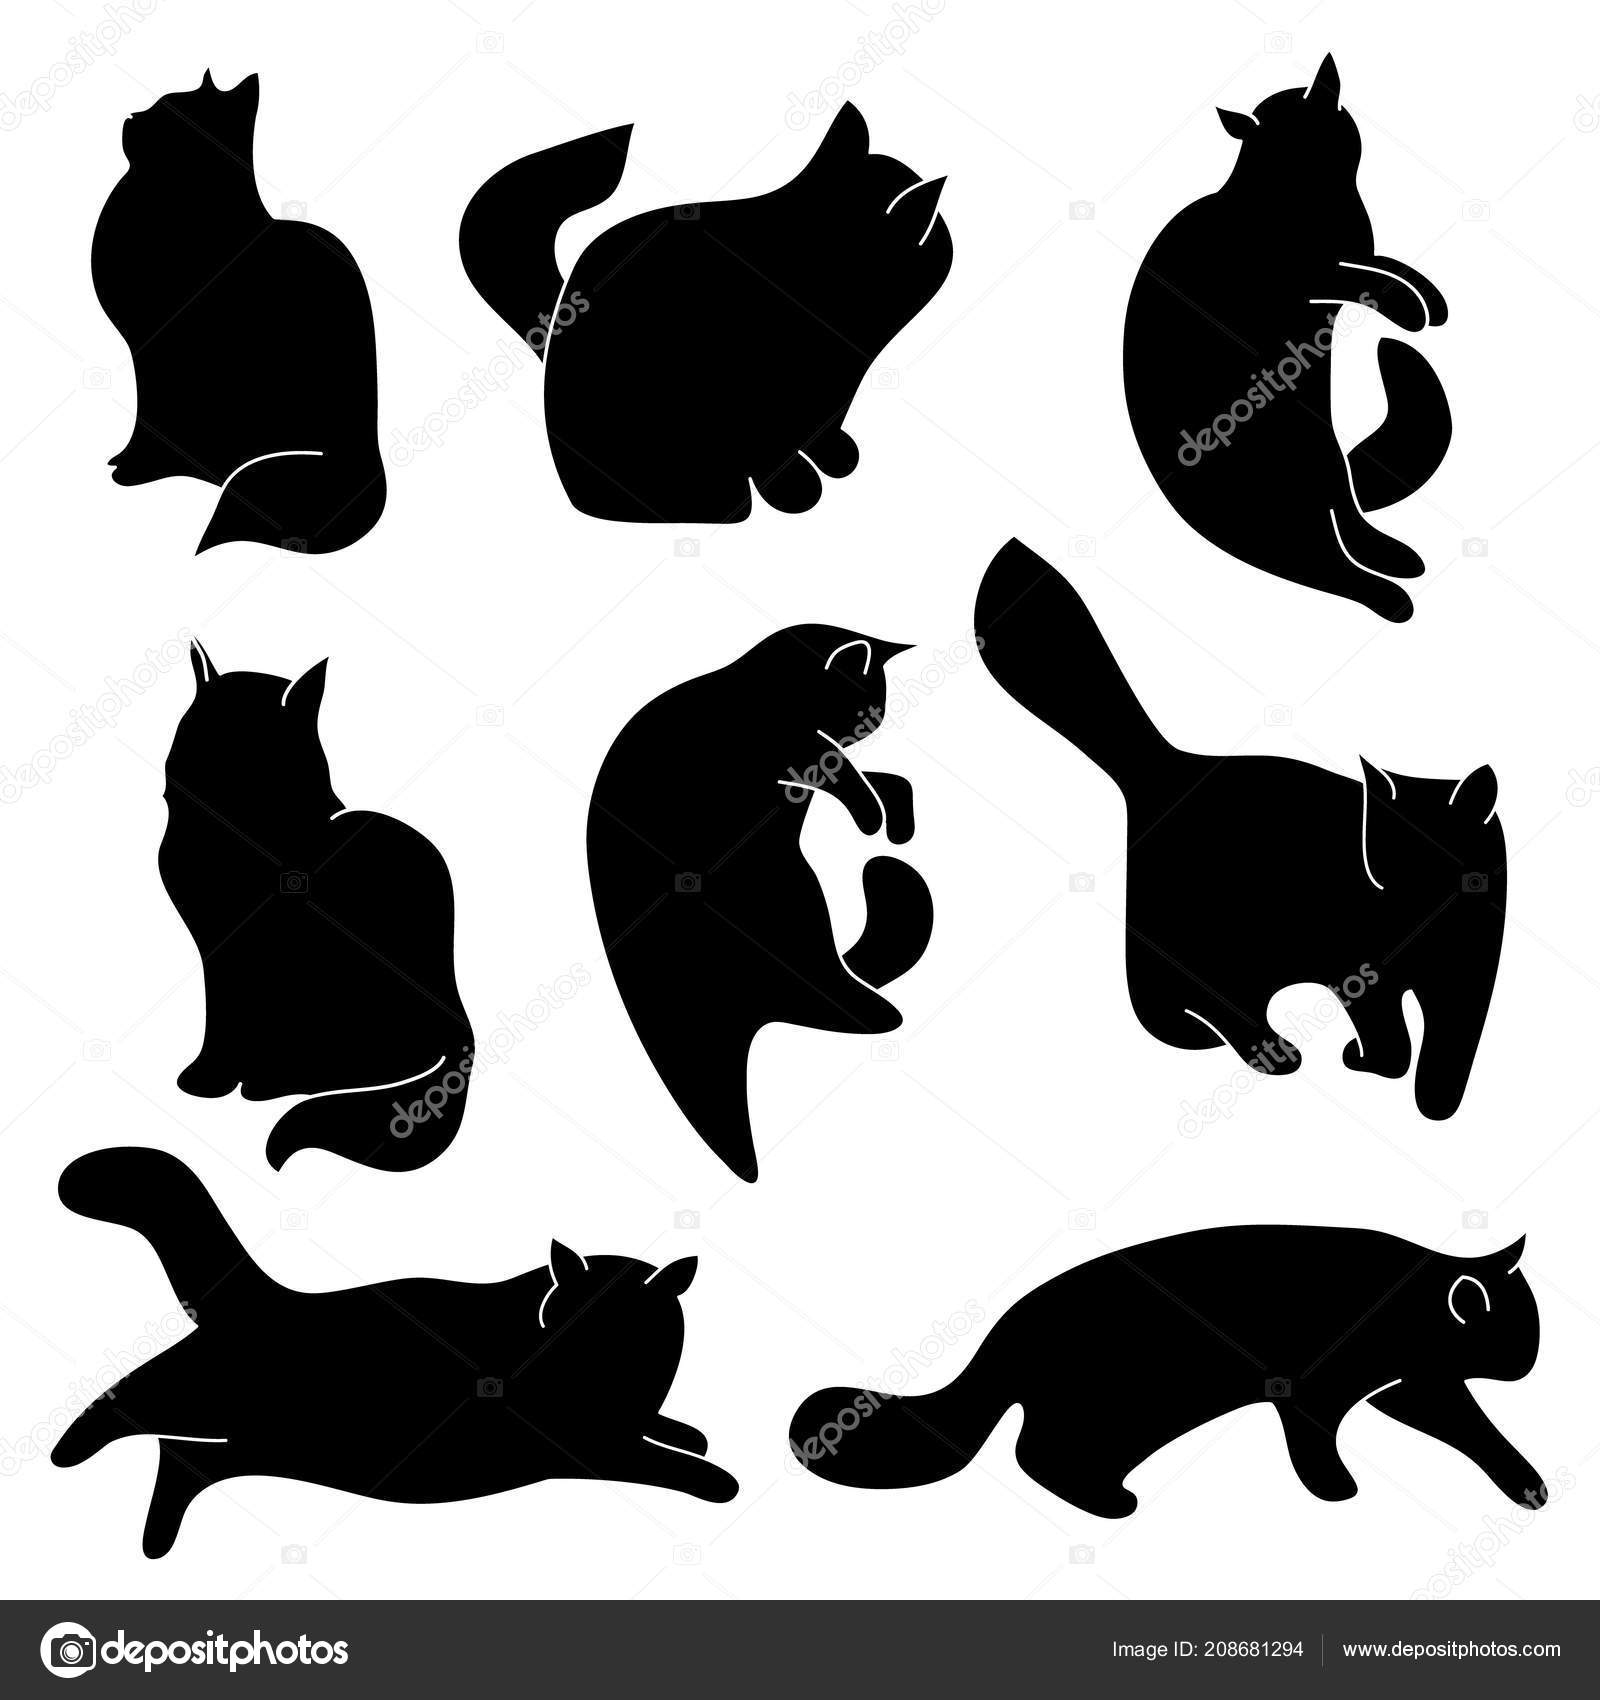 Vector Conjunto Siluetas Gato Diferentes Posturas Sentado Acostado